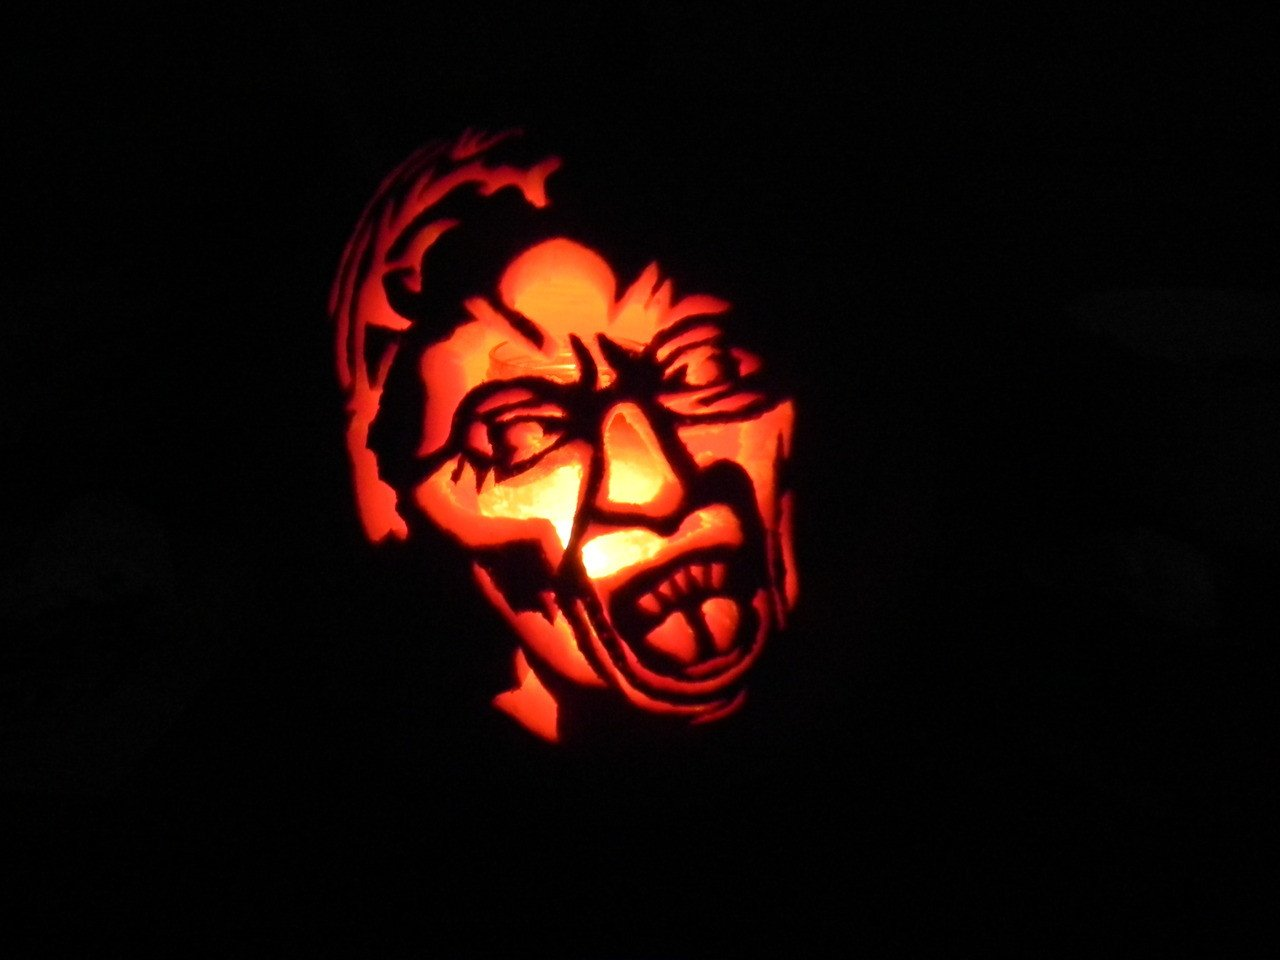 Dalek Pumpkin Stencil 'doctor who' top 5 wholloween Pumpkin Carving Creations